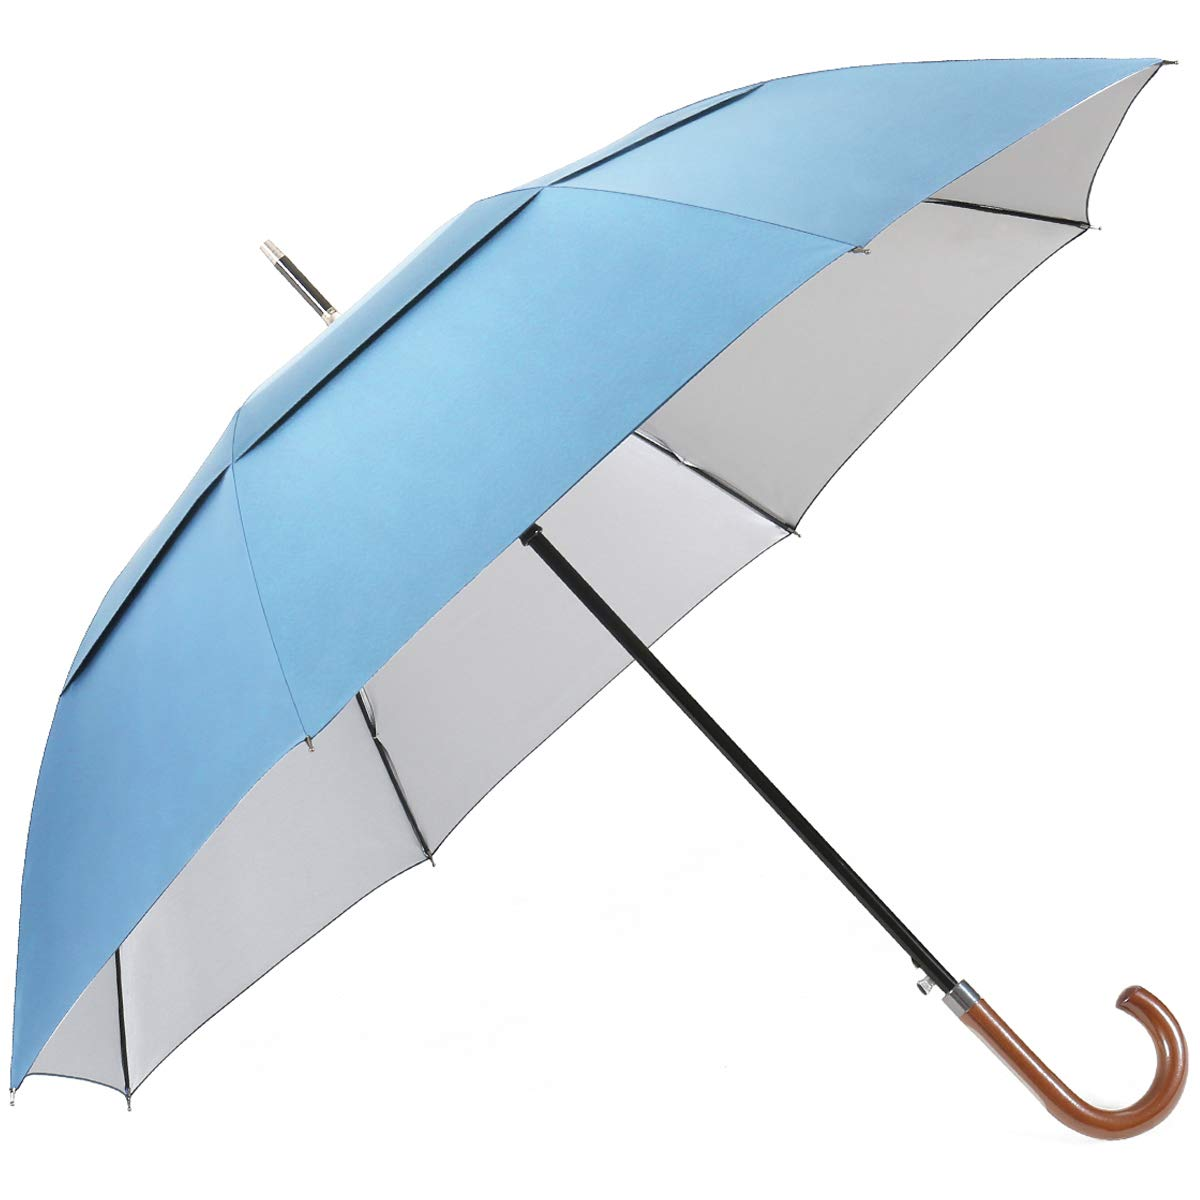 G4Free UV Hook Golf Umbrella UPF50 62inch Windproof Auto Open Large Oversized Double Canopy Vented Cane Stick Sun Block Umbrellas Men Women(Sky Blue) by G4Free